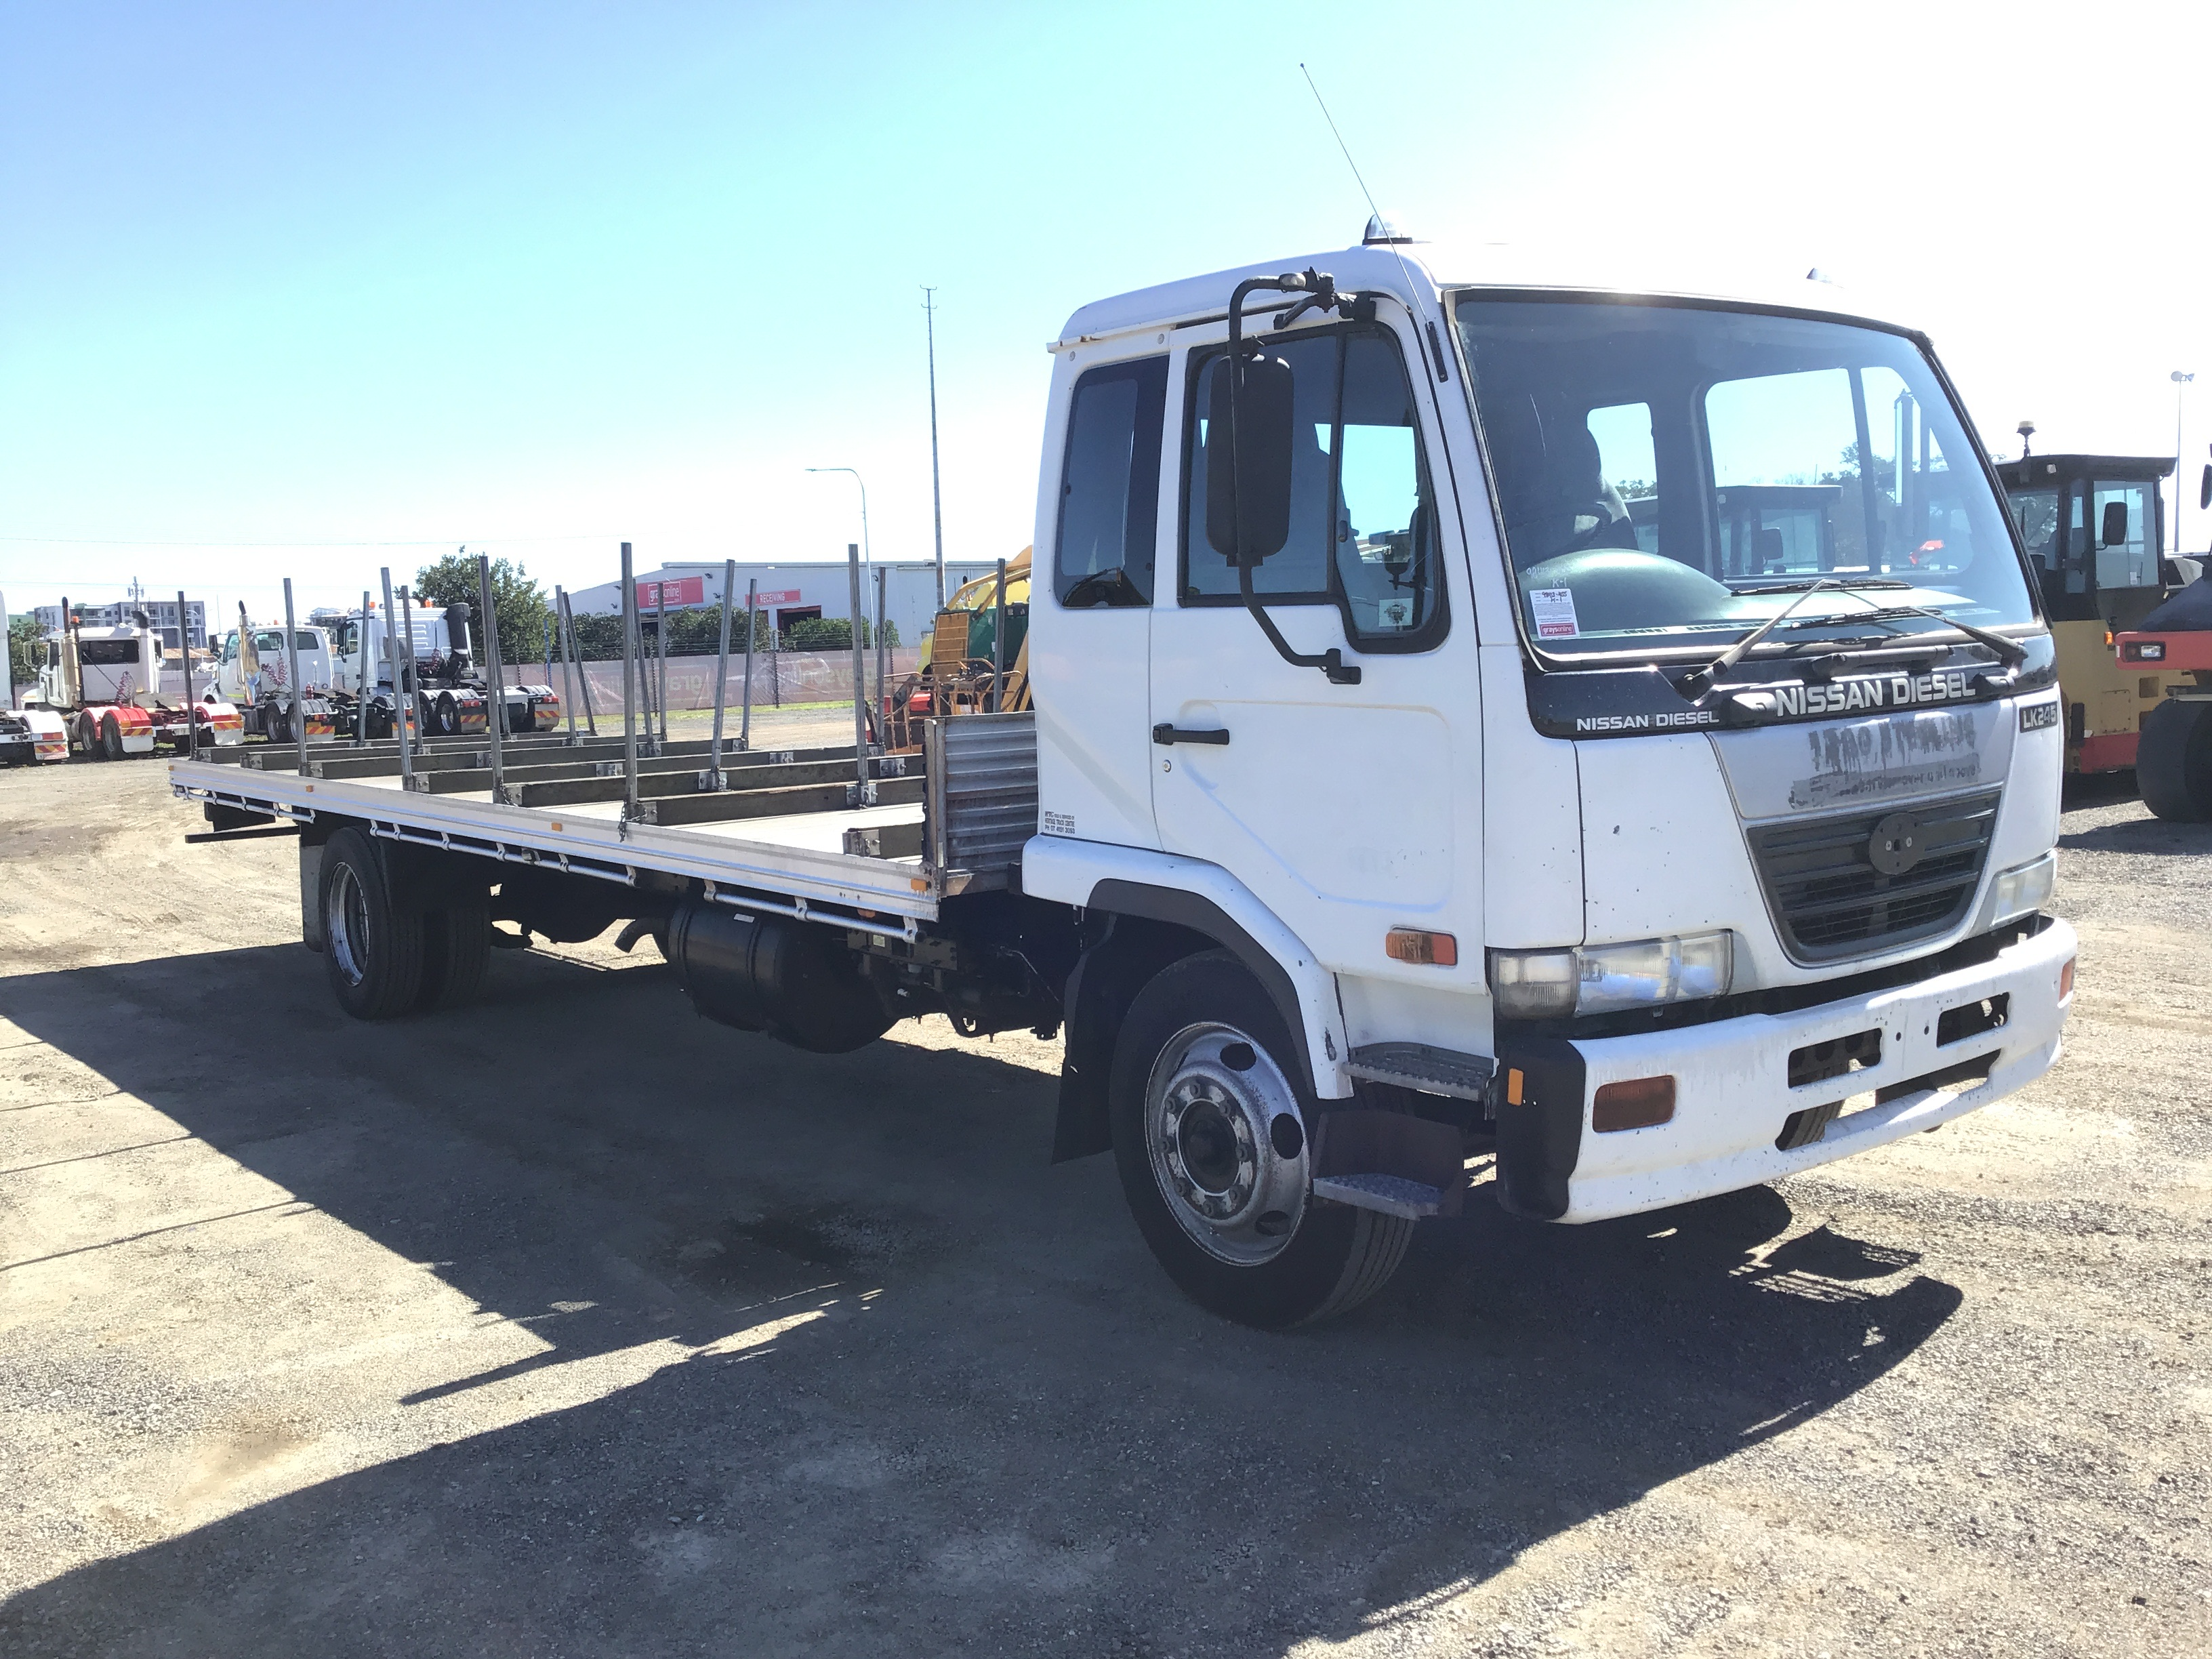 2004 Nissan U.D PK245 (Ex Corp) 4 x 2 Tray Body Truck